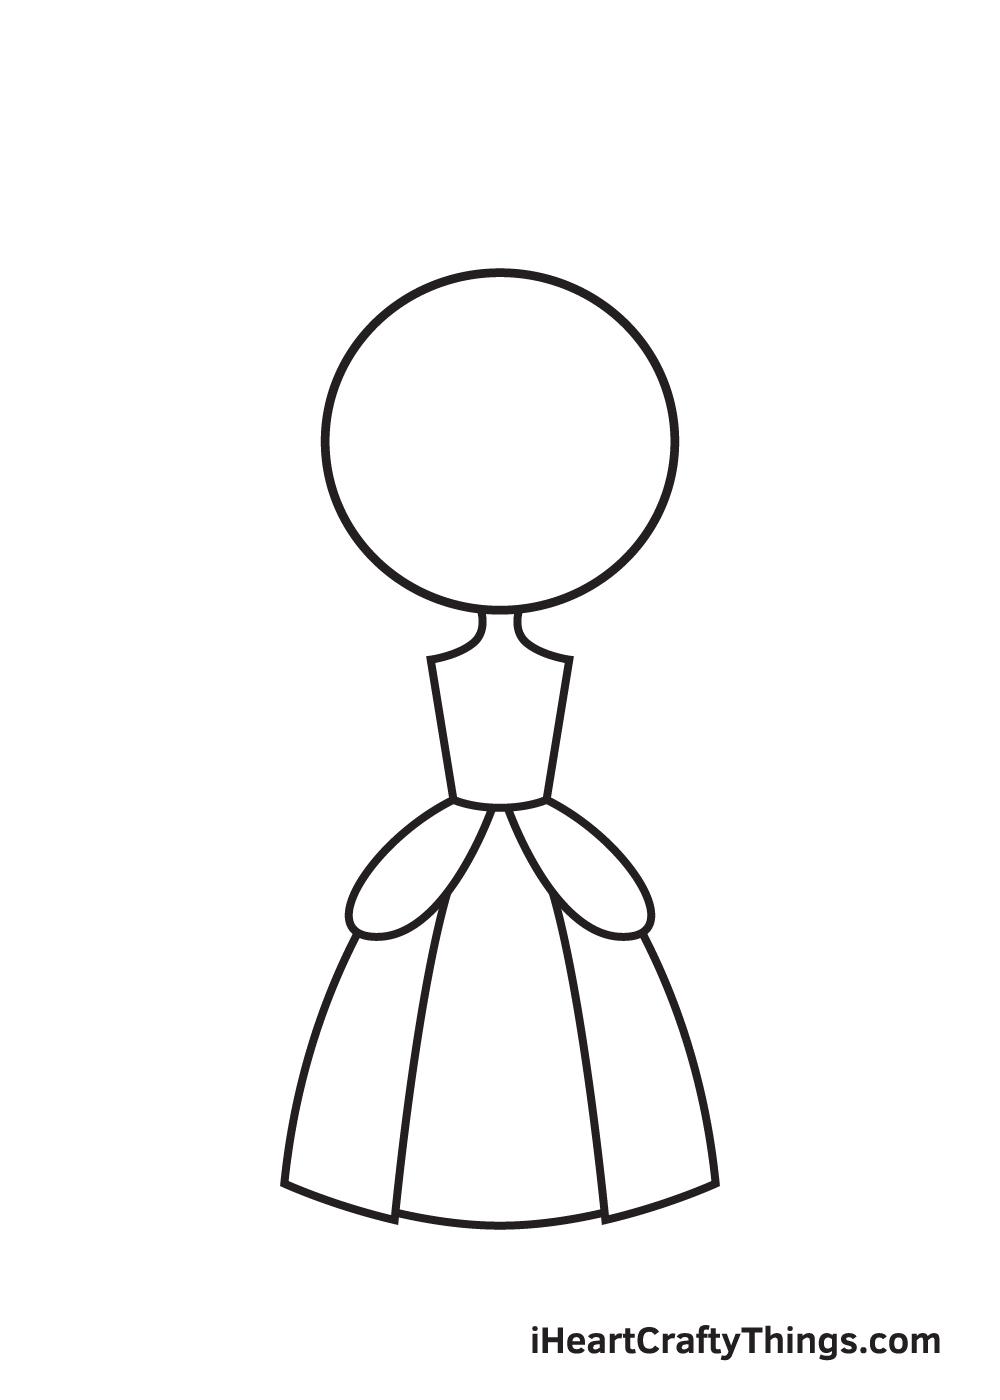 Princess Drawing – Step 4